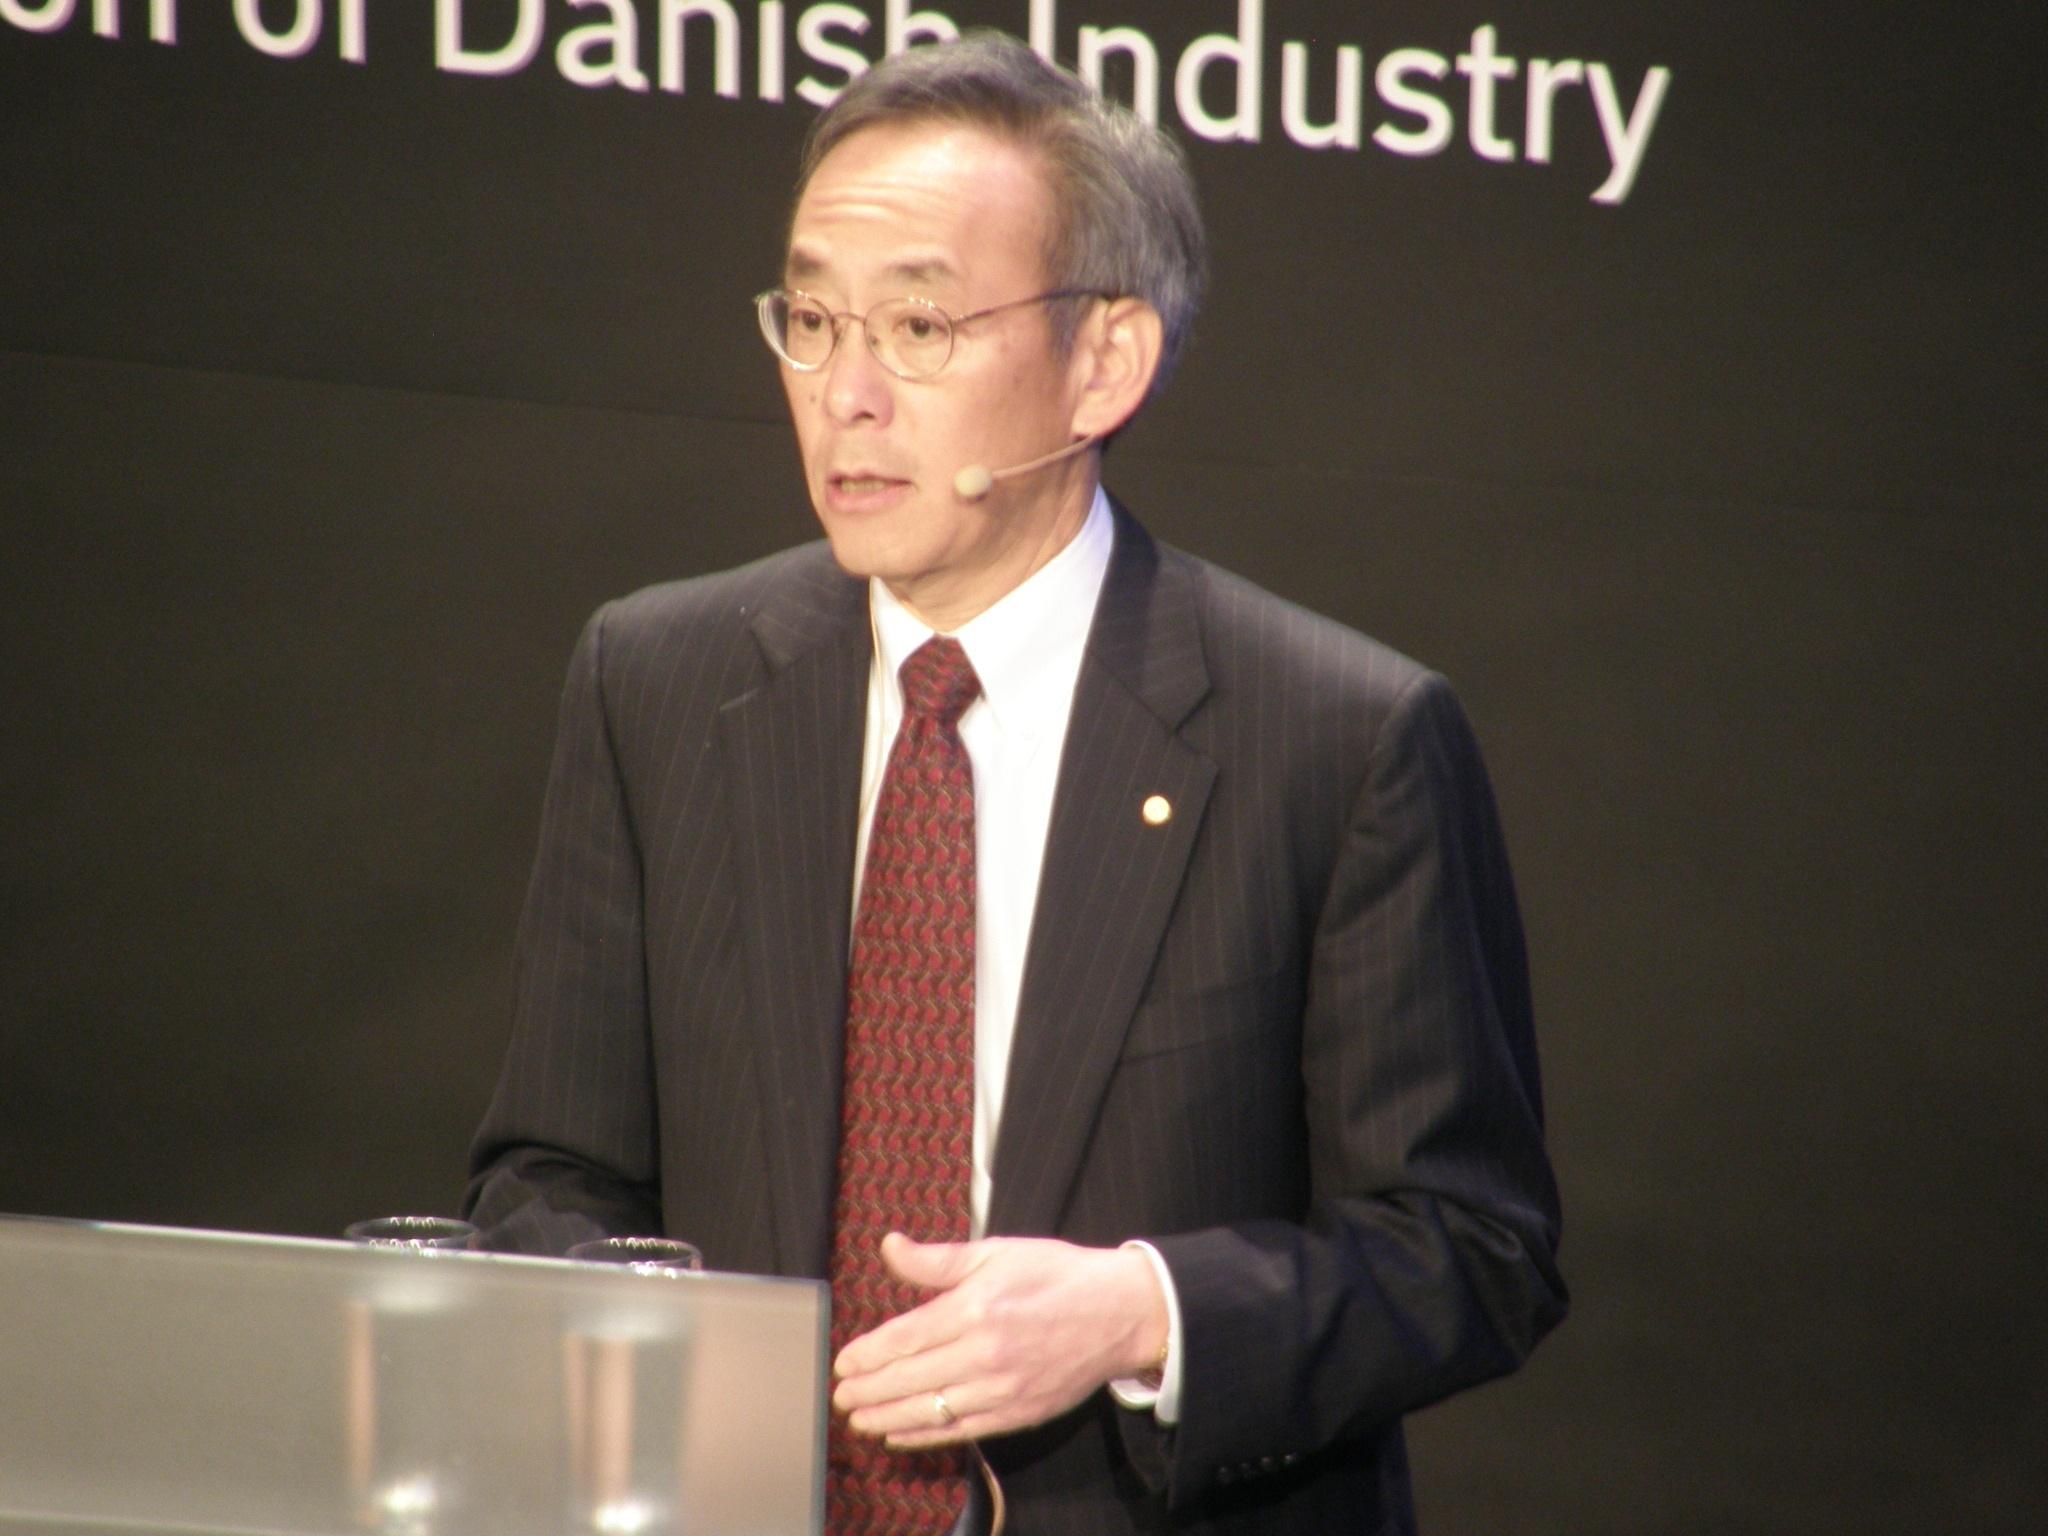 Copenhagen: U.S. Energy Secretary Highlights Power of the Stimulus Funds